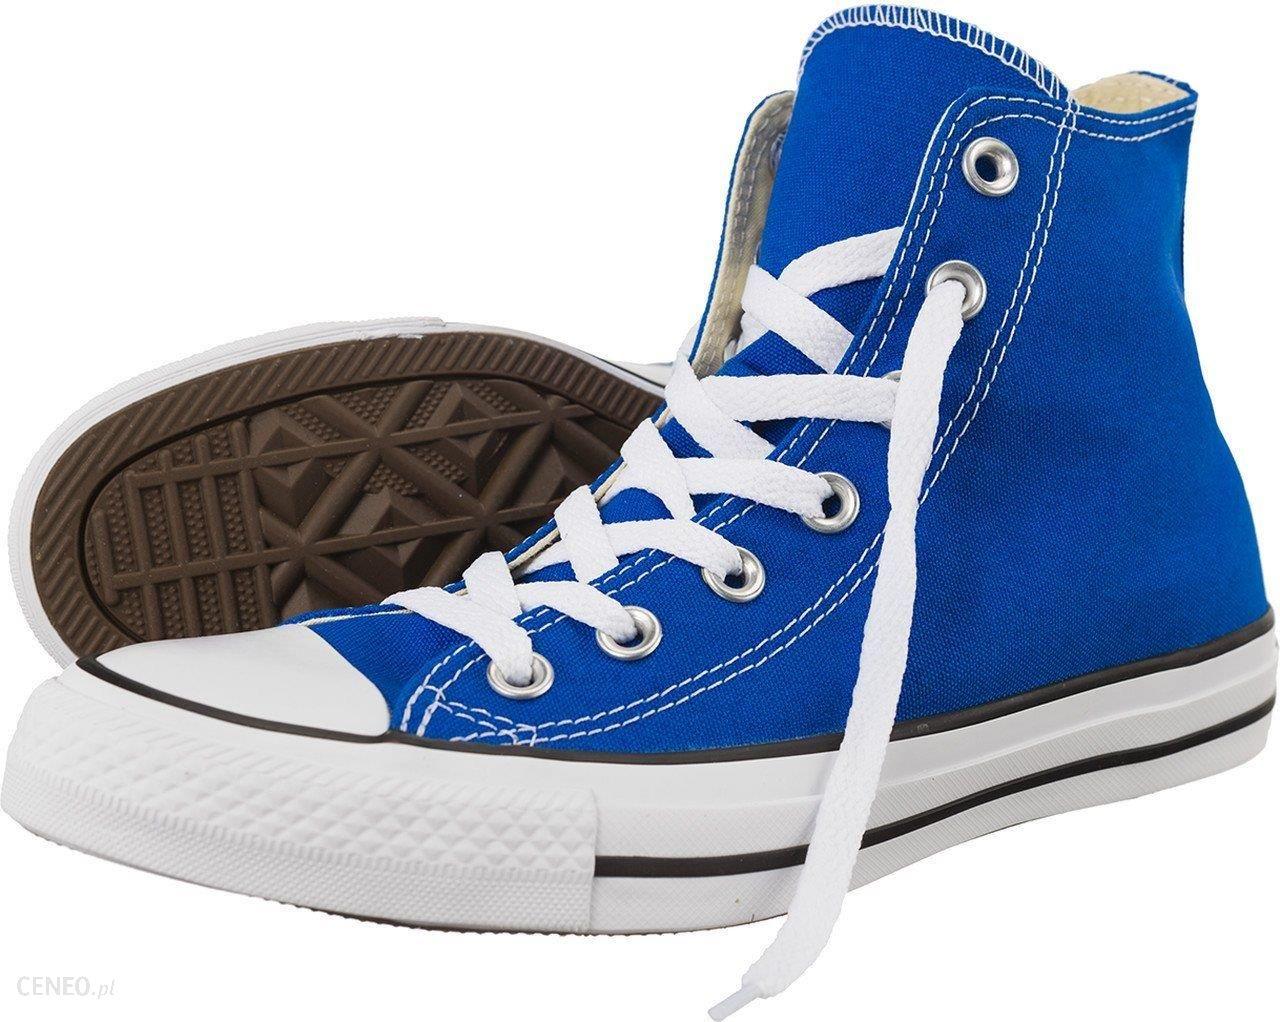 4d83c242c2fc Converse Trampki męskie Chuck Taylor All Star niebieskie r. 44 (C155566) -  zdjęcie